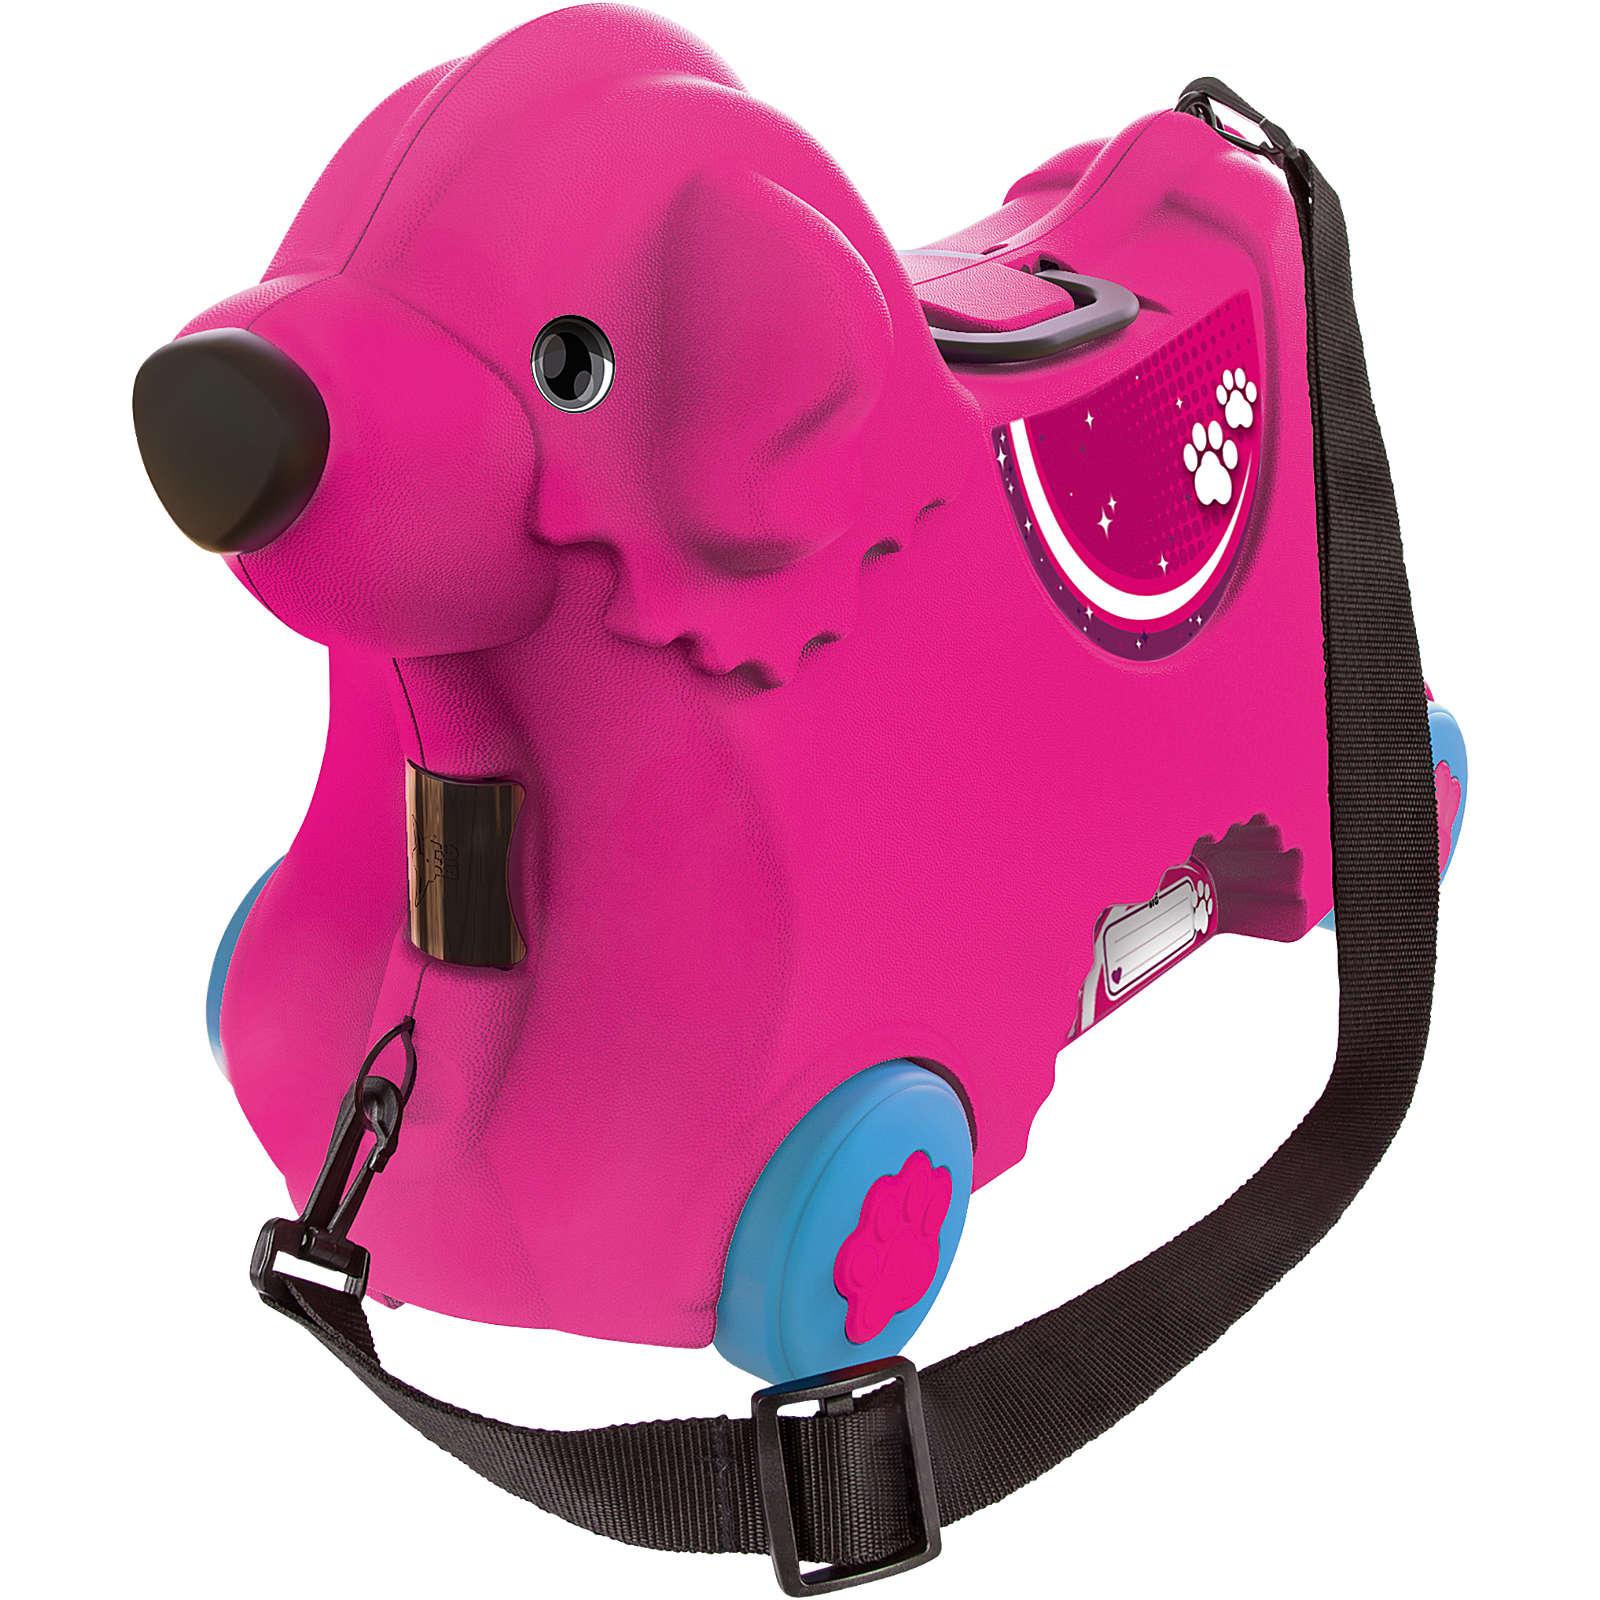 BIG-Bobby-Trolley, pink pink Mädchen